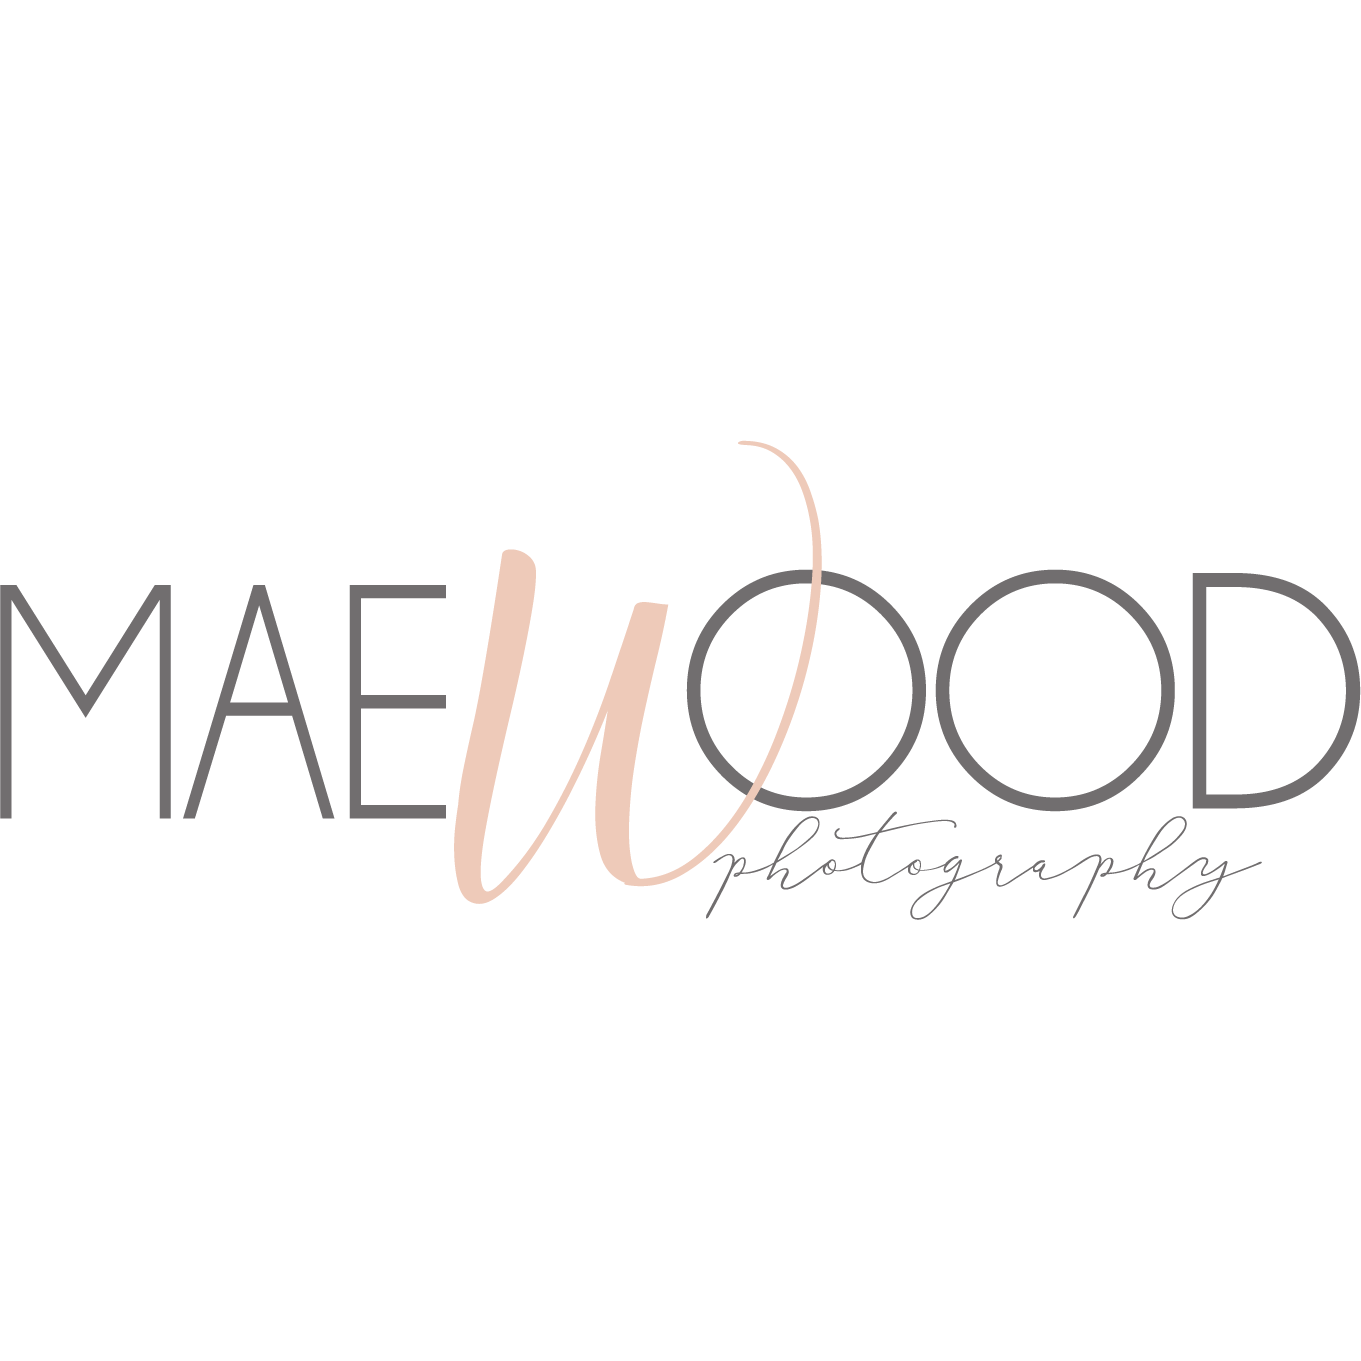 MaeWood Photography, LLC